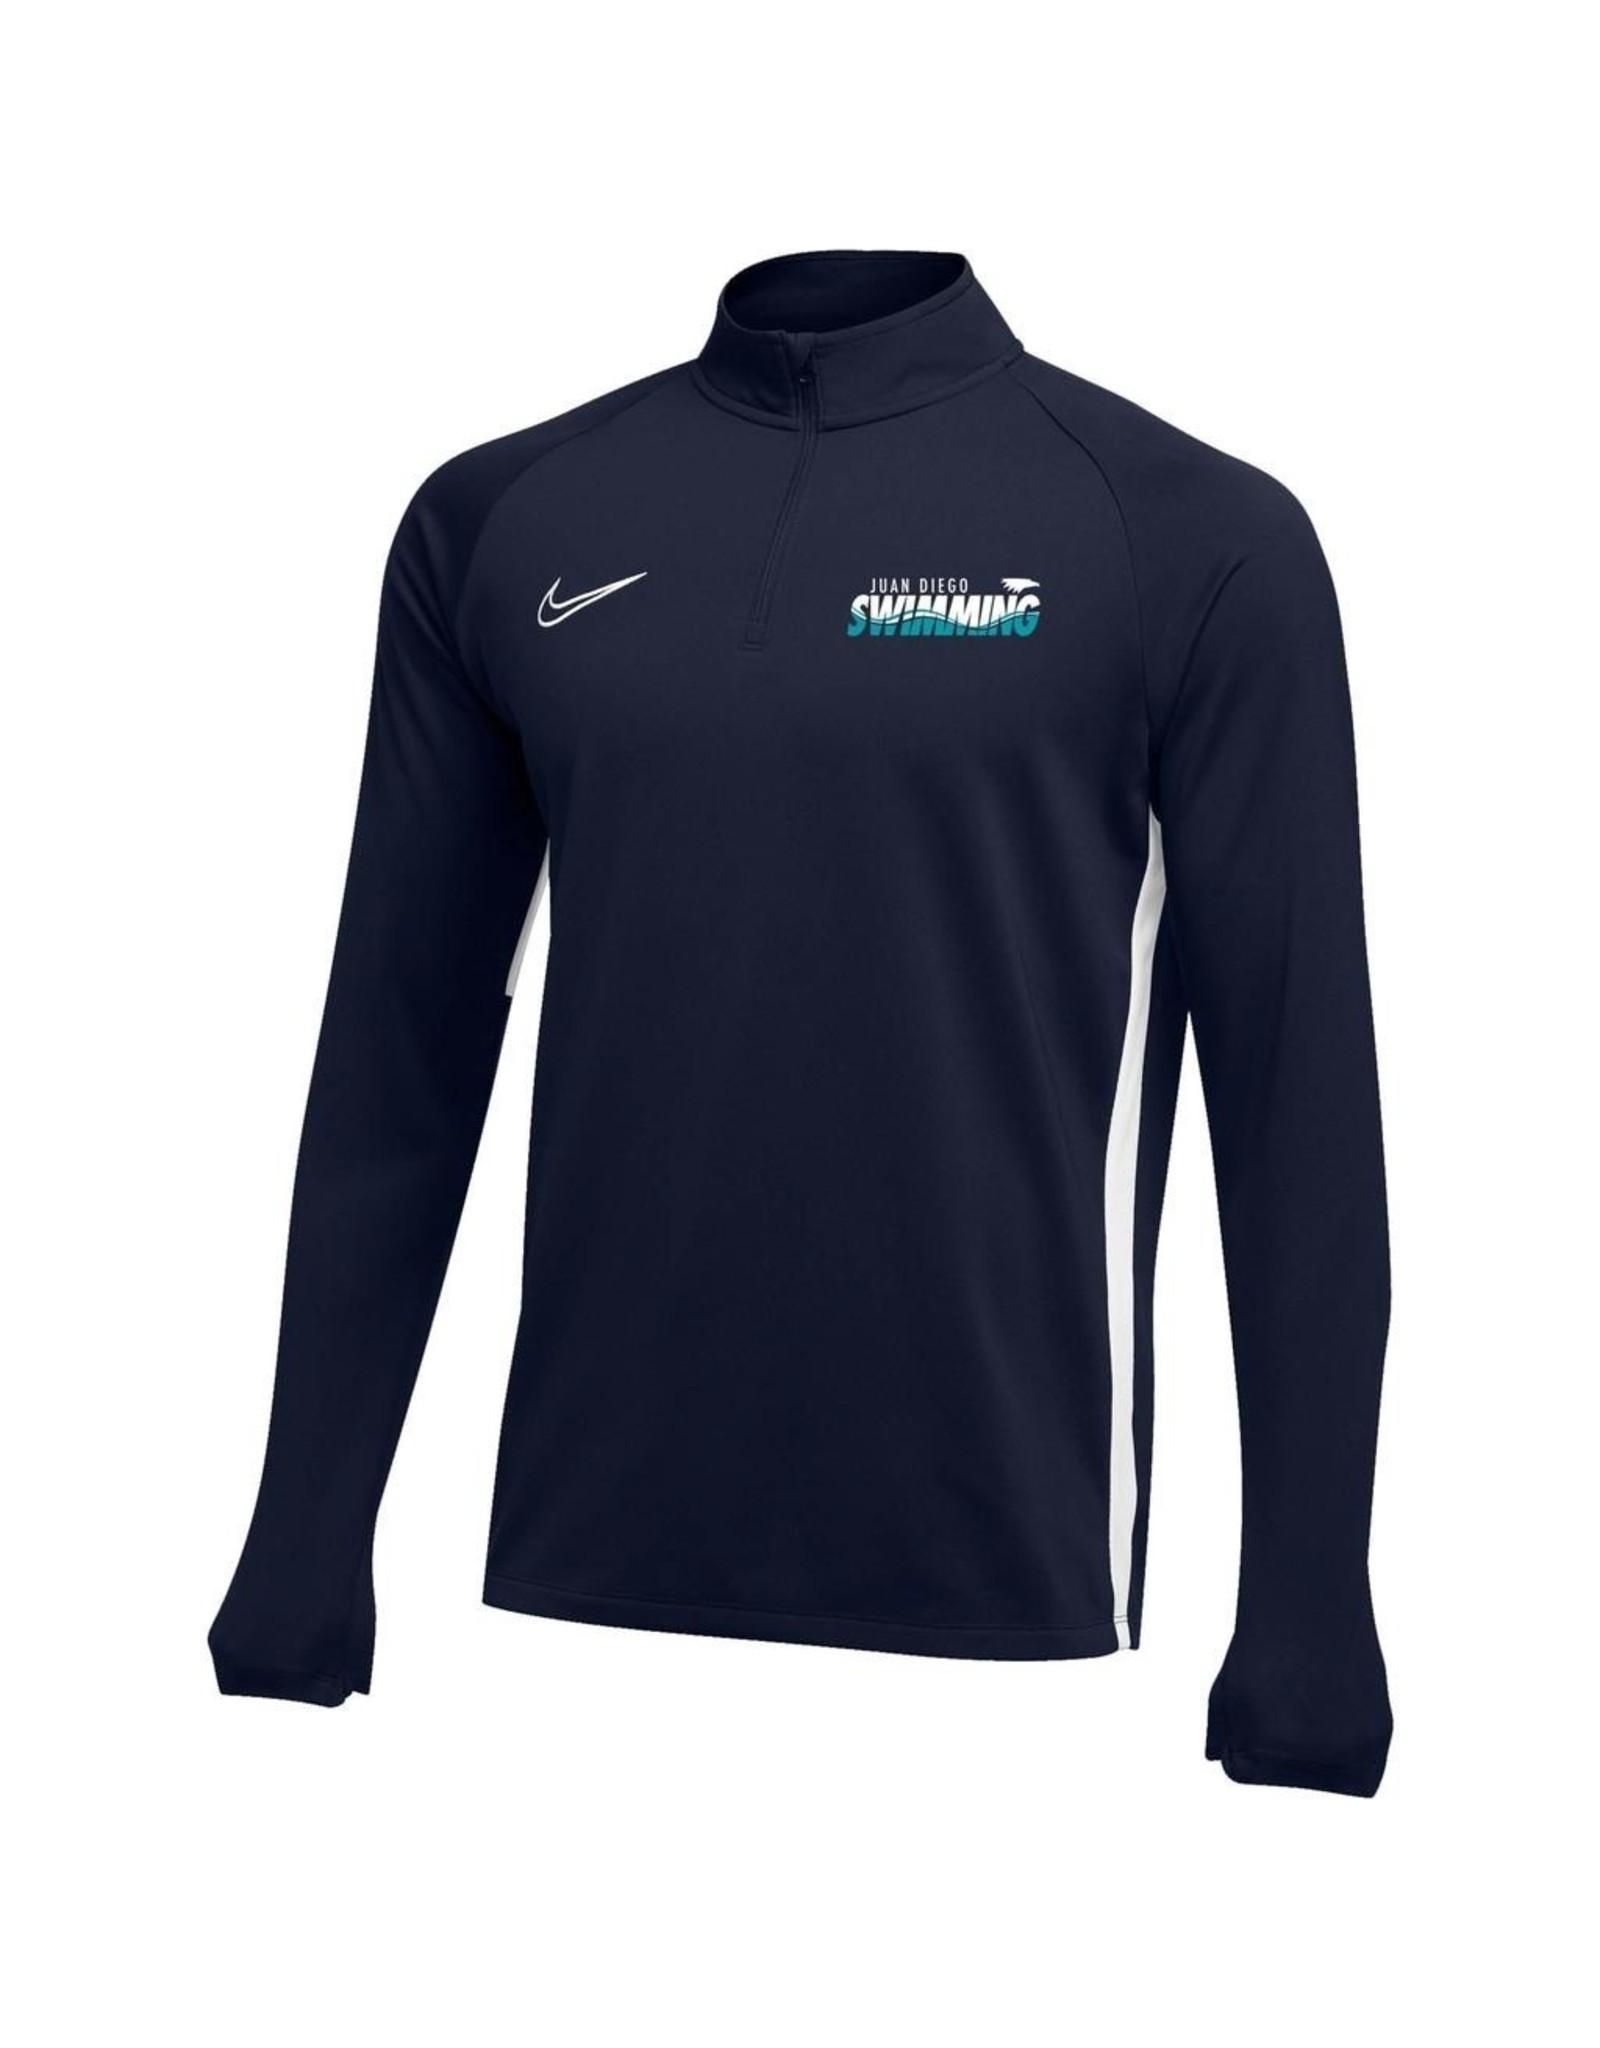 NON-UNIFORM JD Nike Team Academy 19 Drill Top J9094451